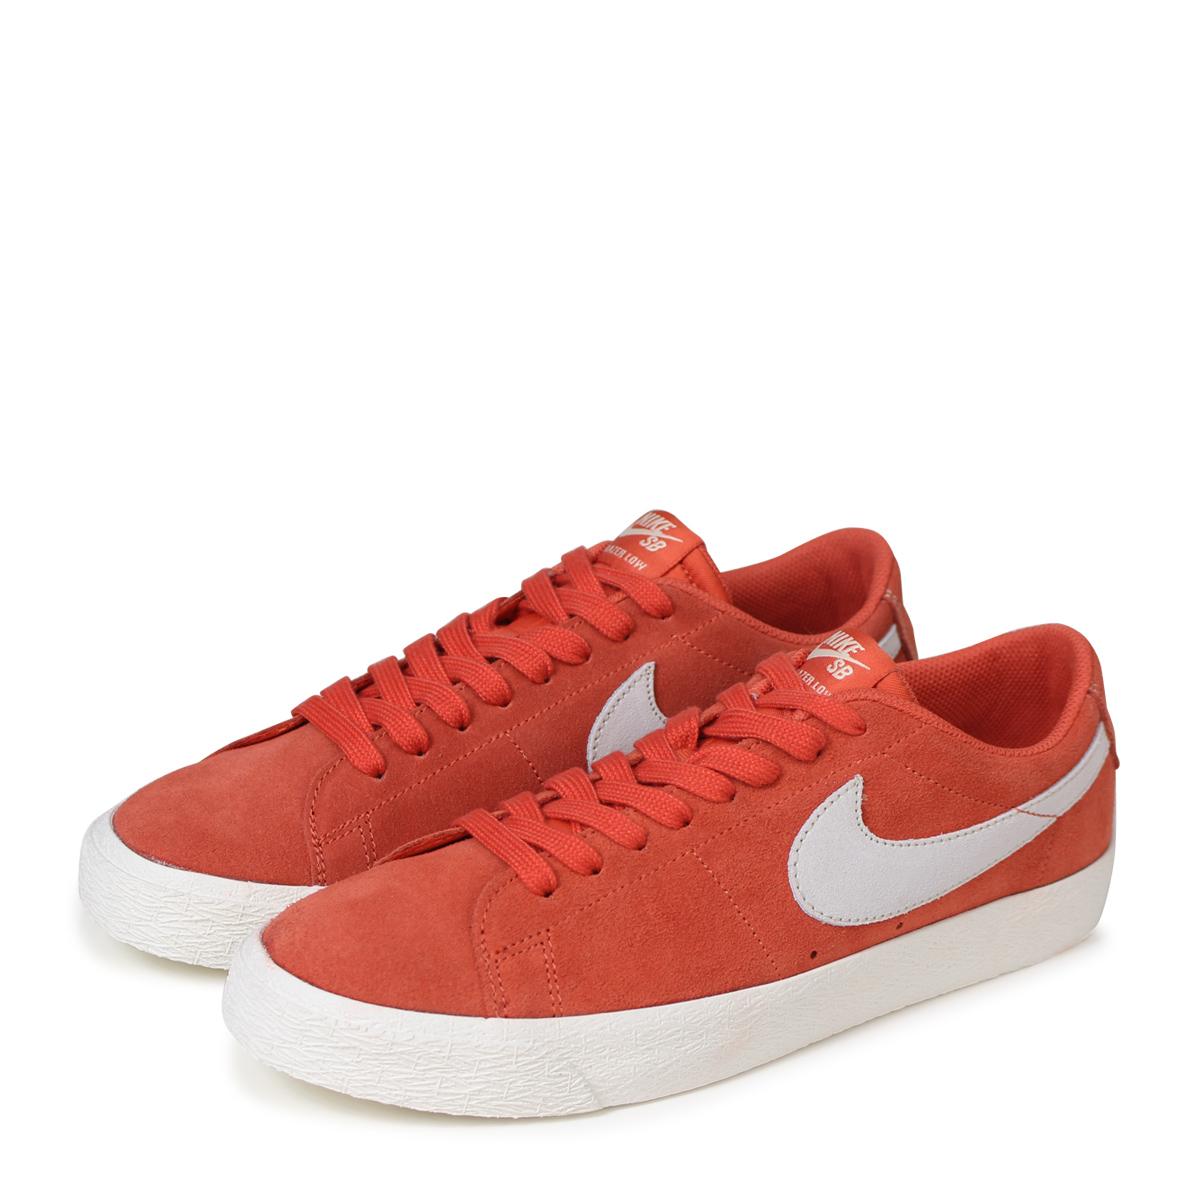 huge discount c94d8 880f0 An NIKE BLAZER ZOOM LOW Nike SB blazer low sneakers men 864,347-800 orange  ...